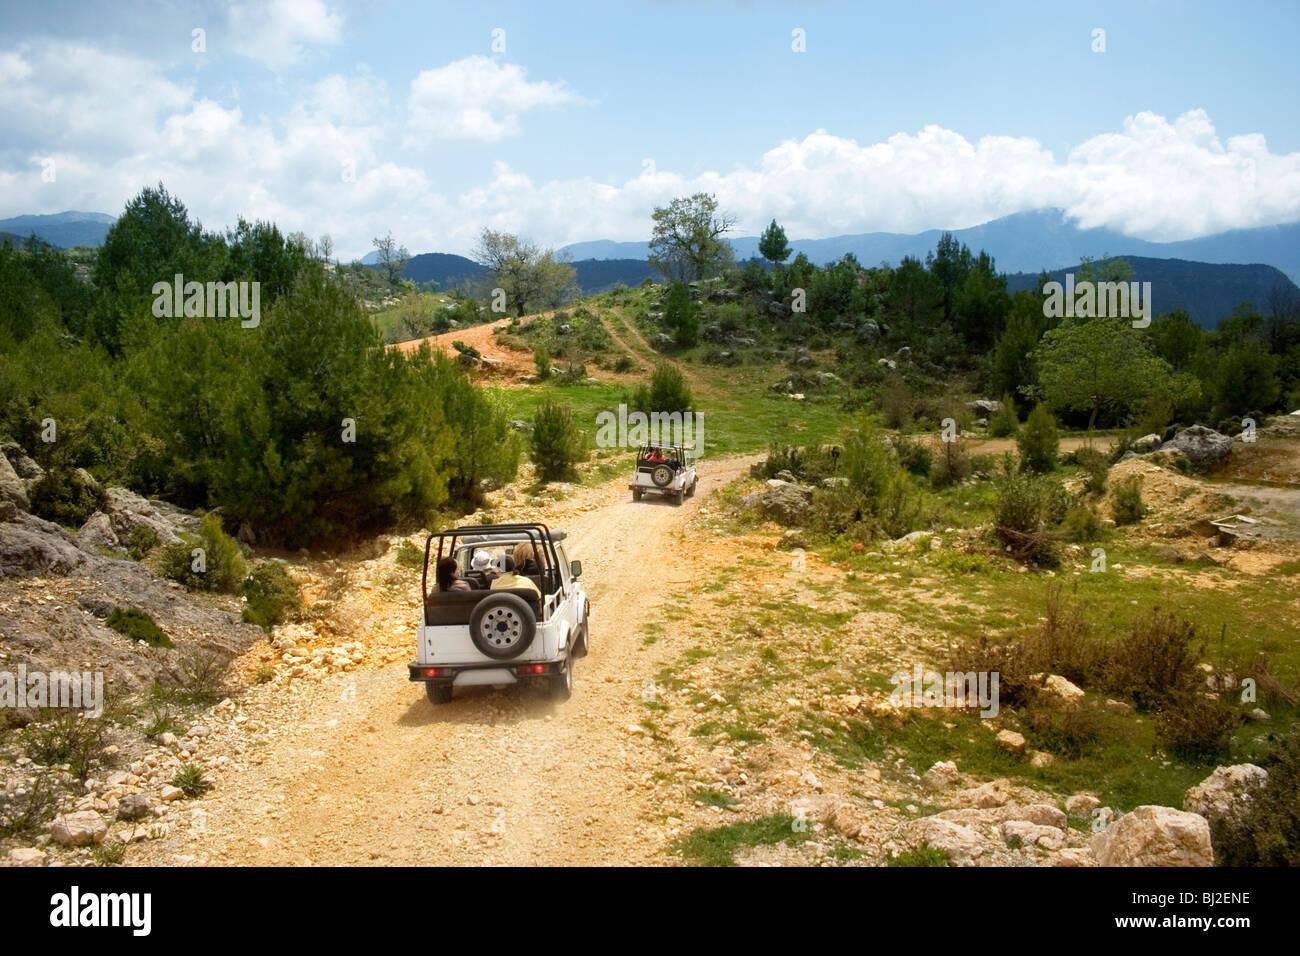 Jeep safari. Mountains of Alanya, Turkey. - Stock Image